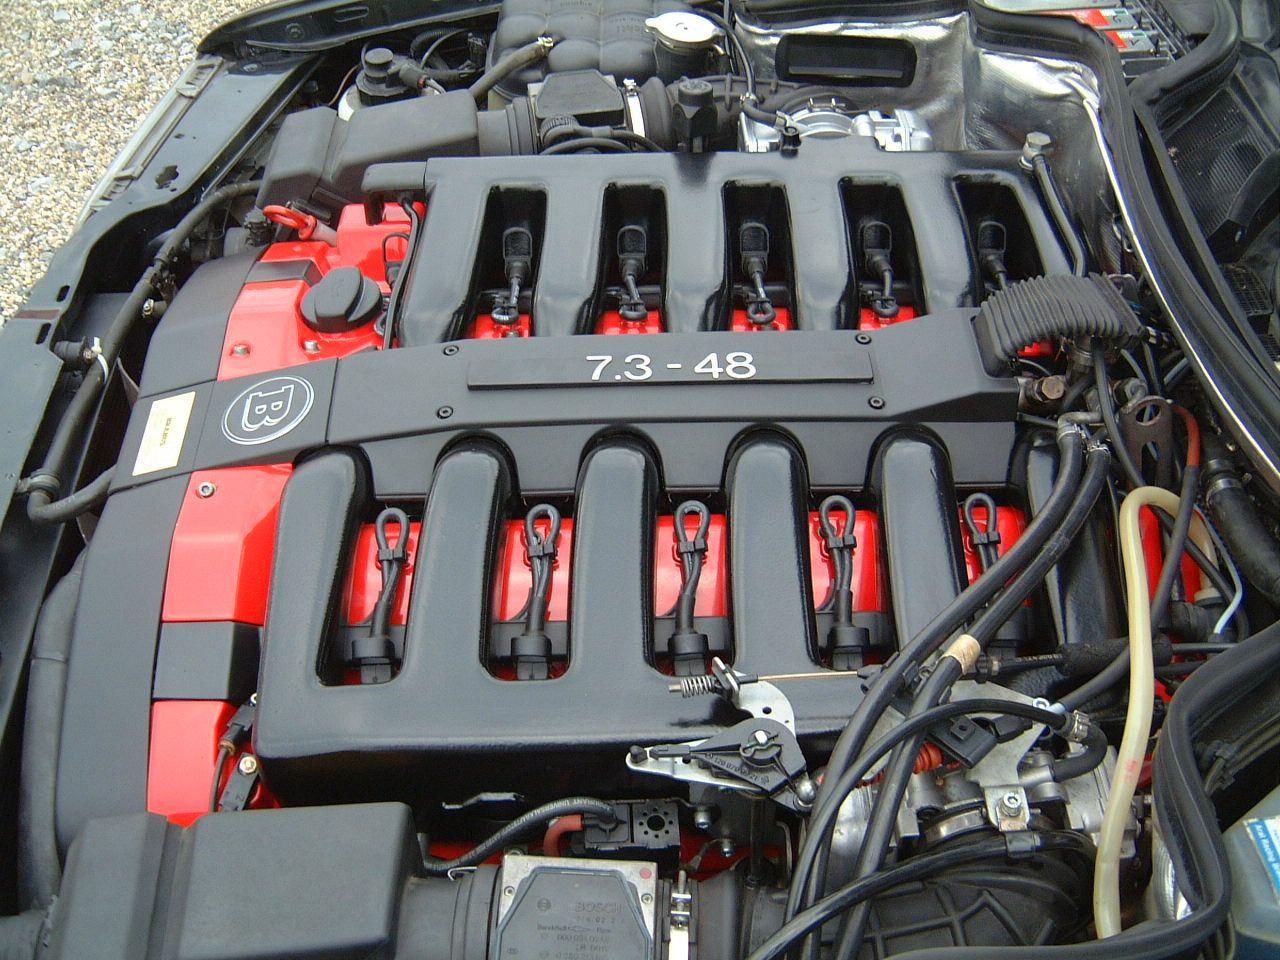 mercedesbenz #brabus #engine #w124 #48valve #V12 #7 3 | Cars